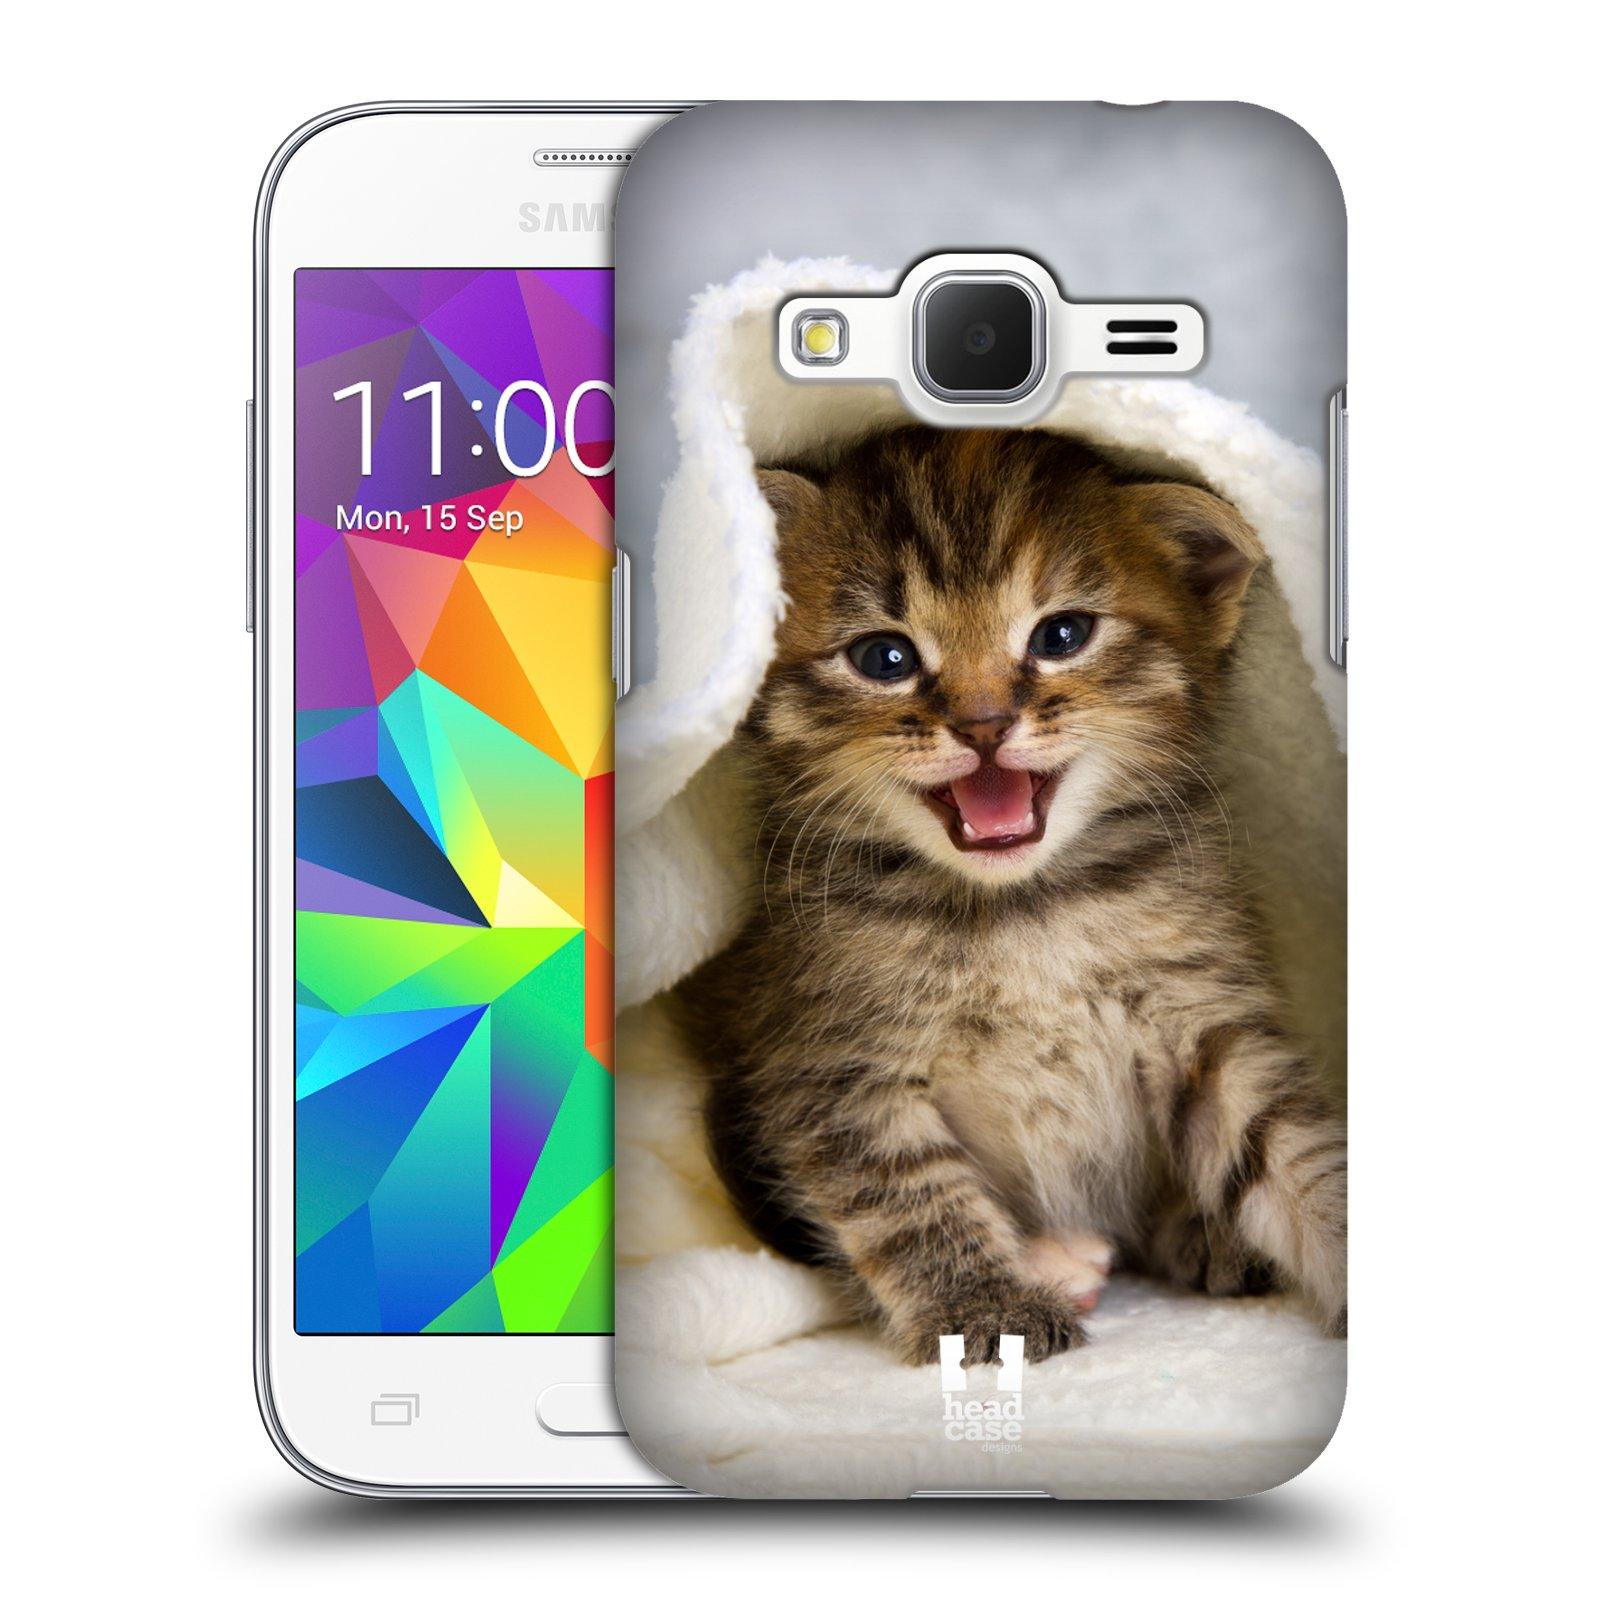 HEAD CASE plastový obal na mobil SAMSUNG GALAXY Core Prime (Core Prime VE) vzor Kočičky koťata foto kotě v ručníku